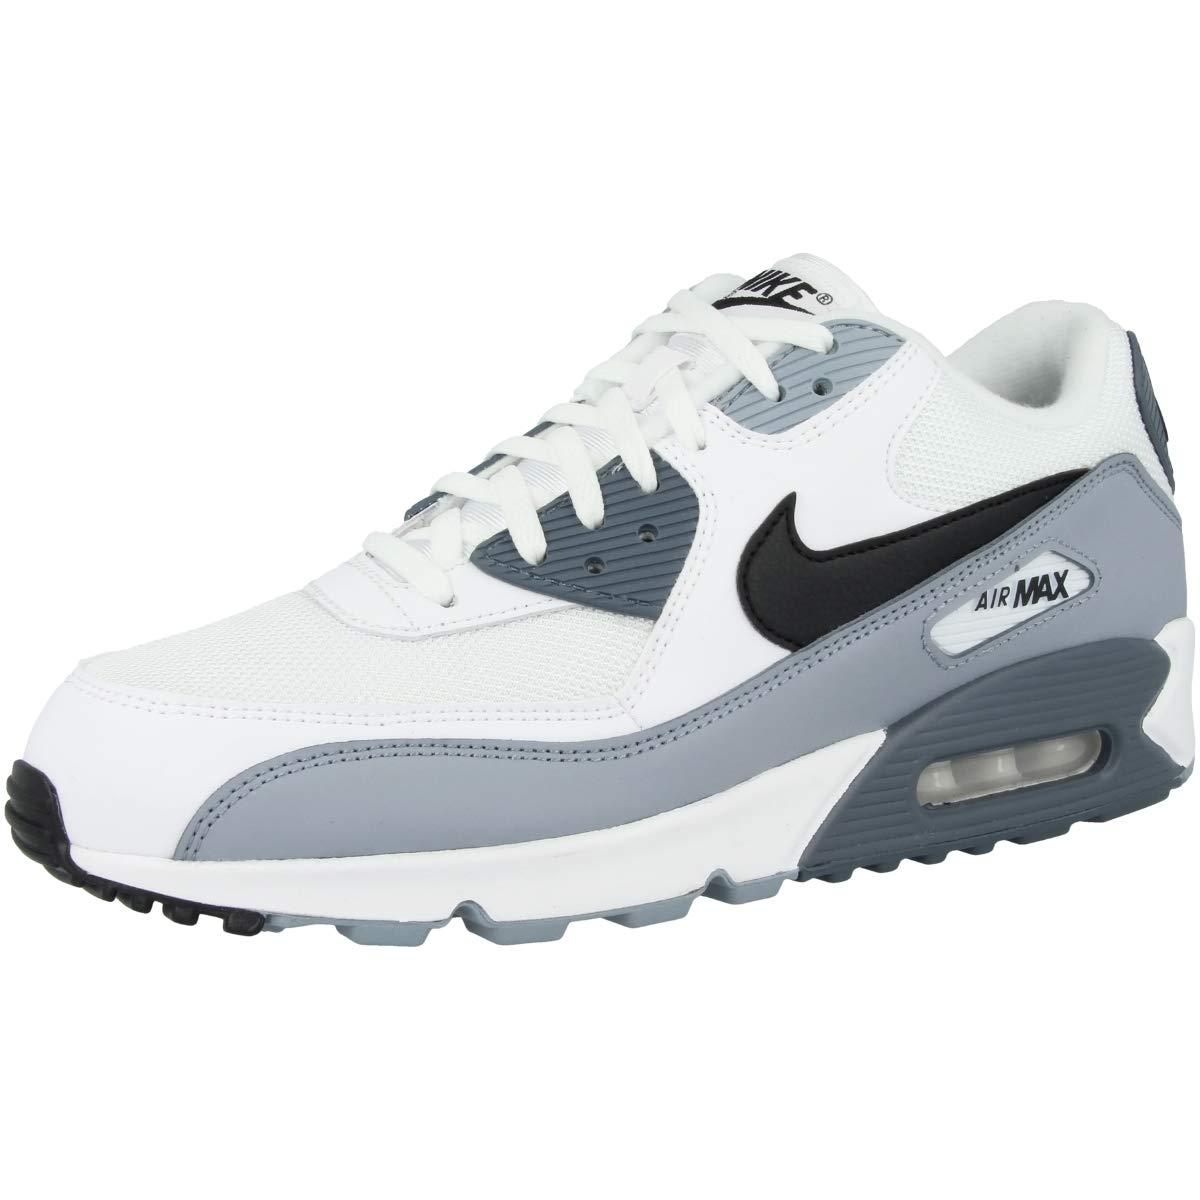 Details zu Nike Air Max 90 Essential Sneaker Schuhe Herren AJ1285 108 Weiß